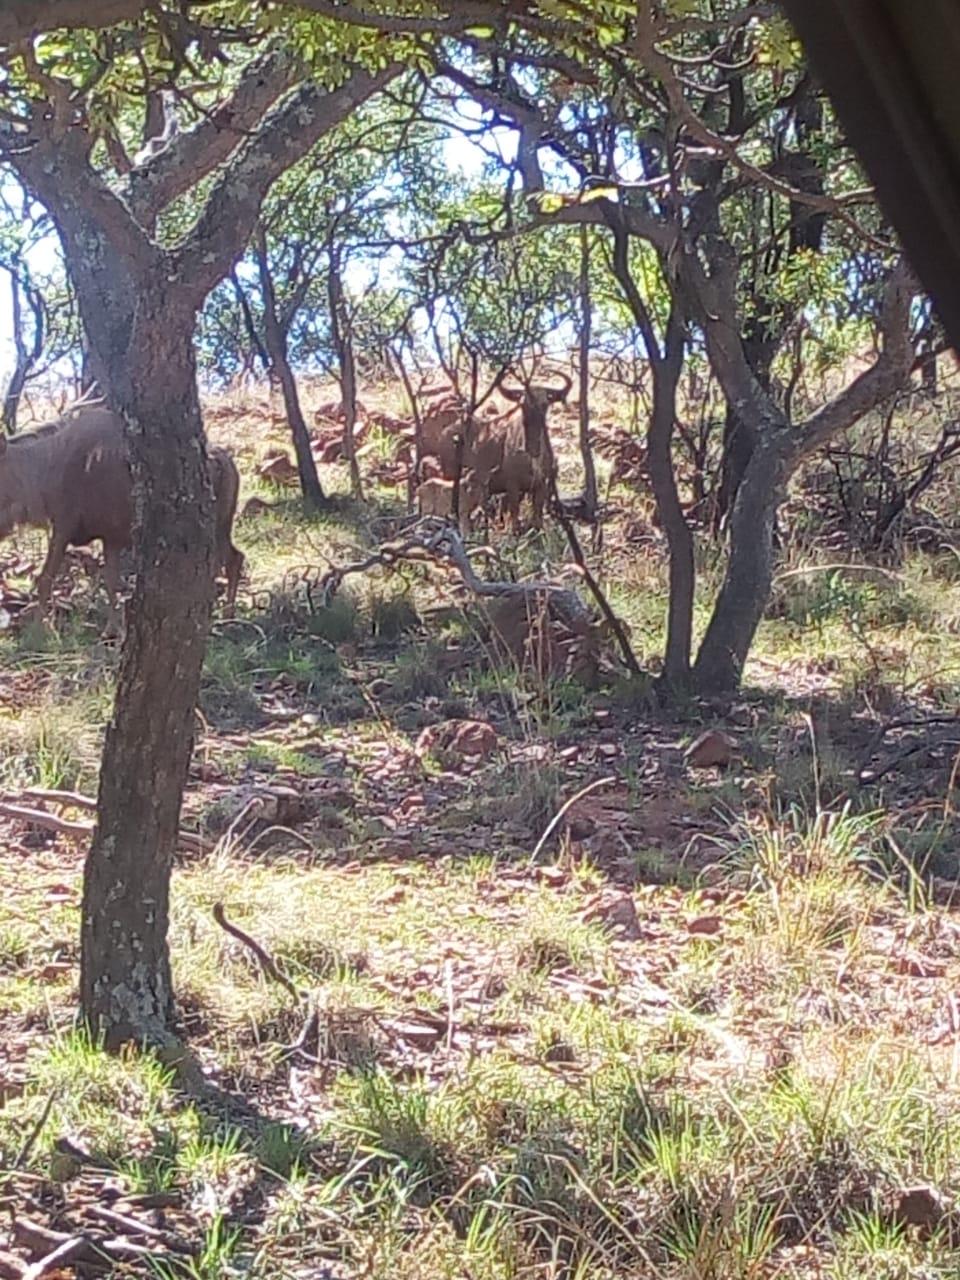 Brush Country Studios South Africa, PO Box 2035, 12 OF THE FARM BAKOVENKRANS 192, MODIMOLLE, 0510, SOUTH AFRICA